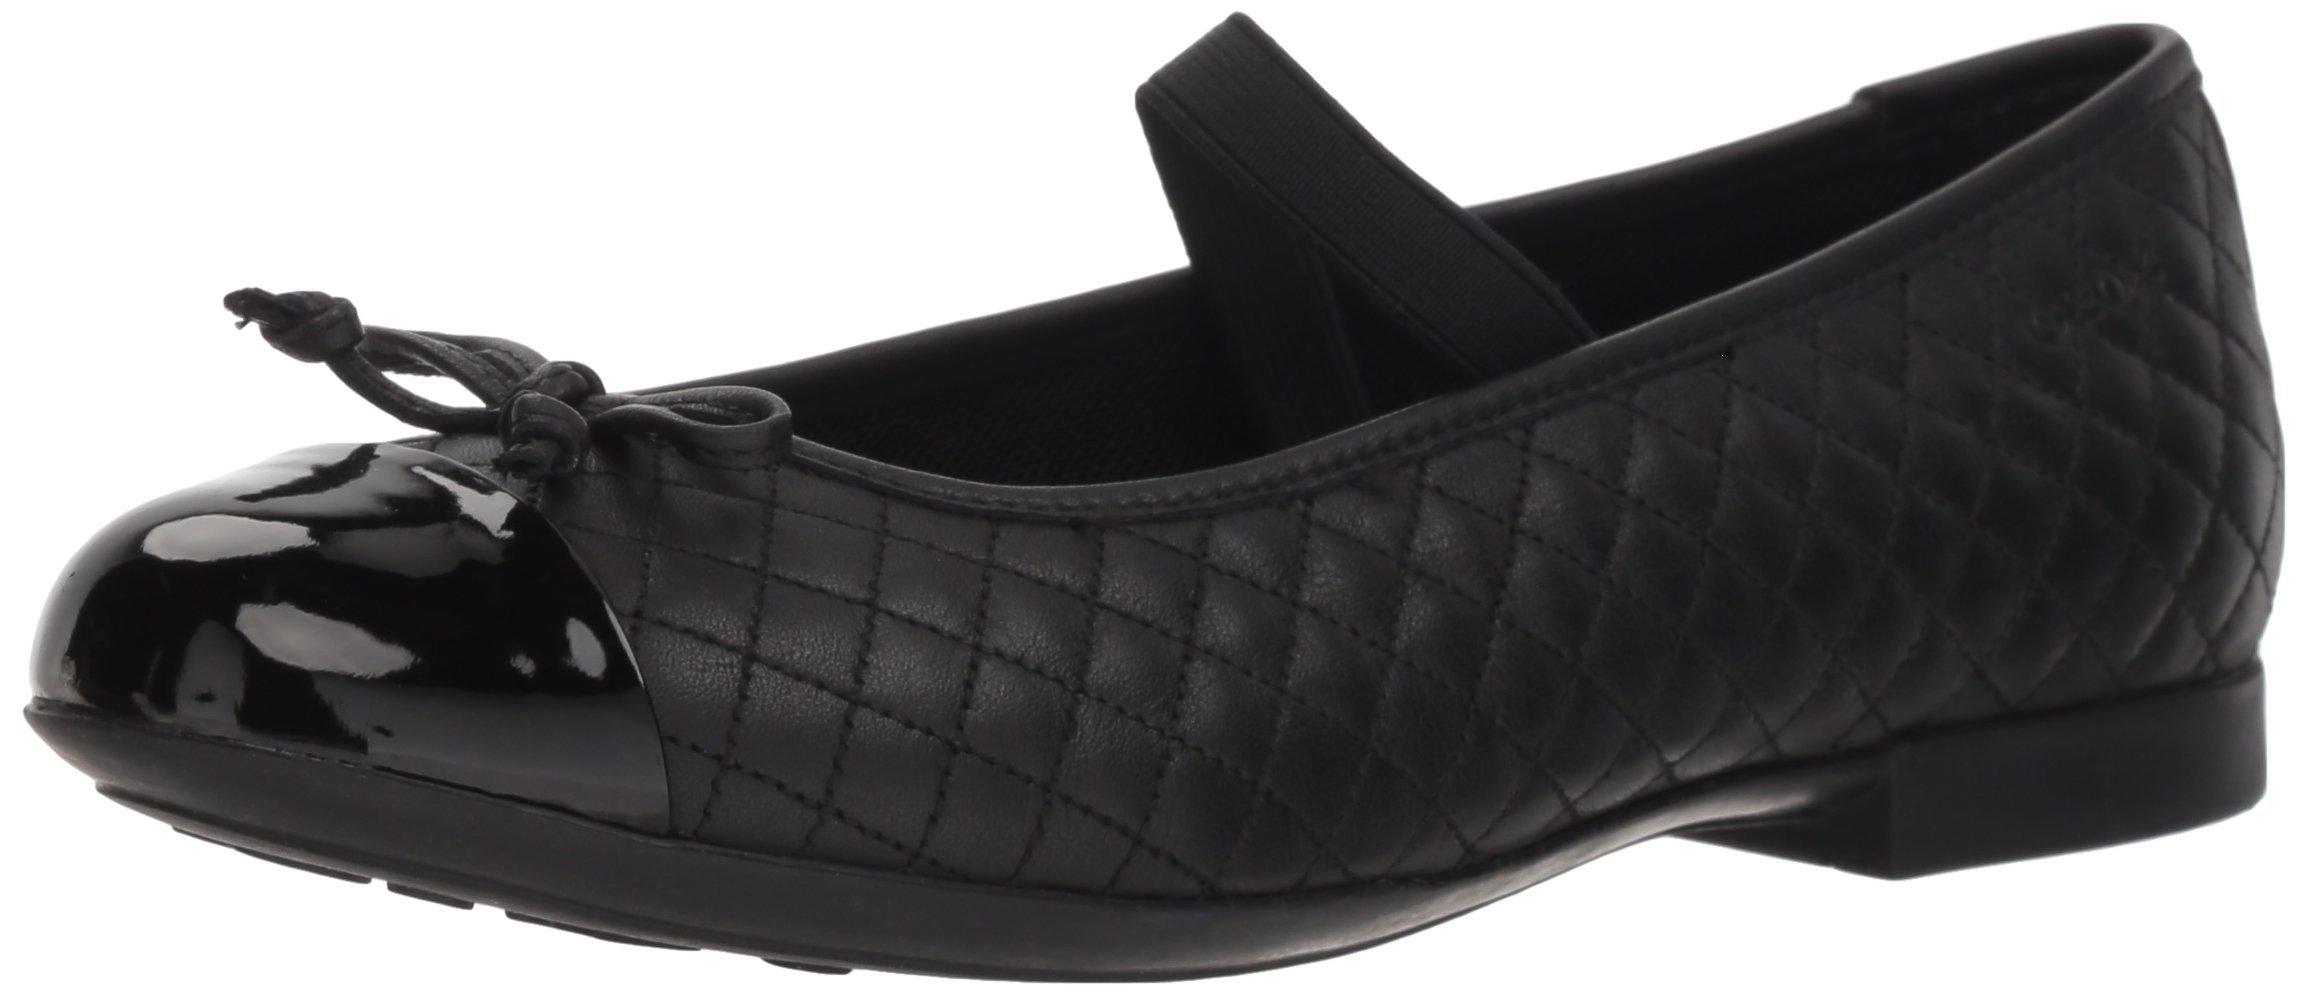 Geox Girls' Plie 49 Quilted Leather Slip-On Ballet Flat Mary Jane, Black, 32 Medium EU Little Kid (1 US)